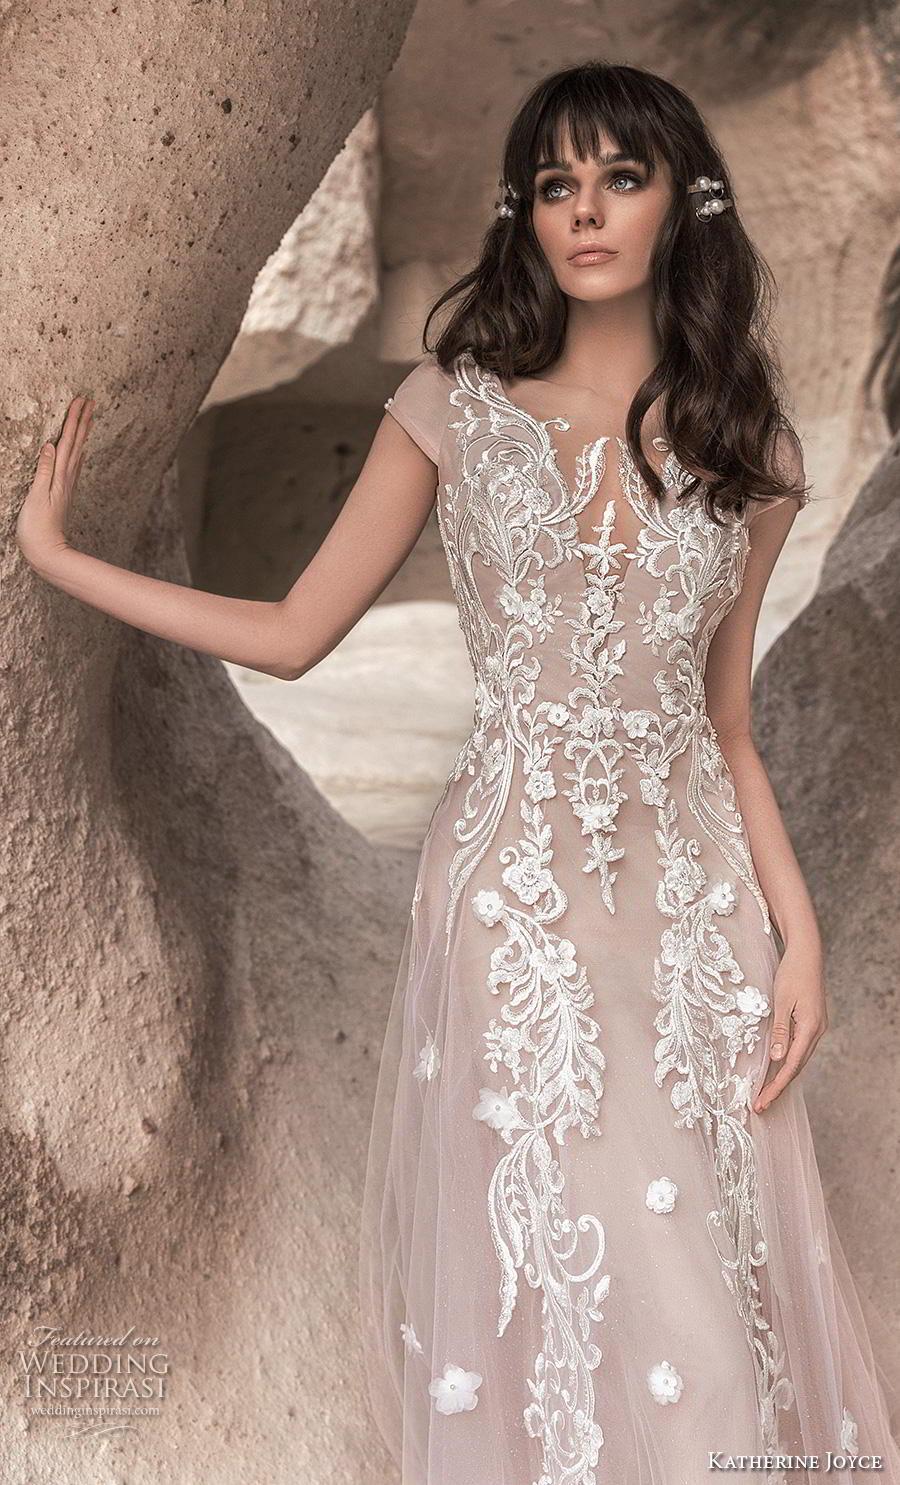 katherine joyce 2020 bridal cap sleeves illusion bateau v neck full embellishment romantic blush soft a  line wedding dress backless v back chapel train (2) zv